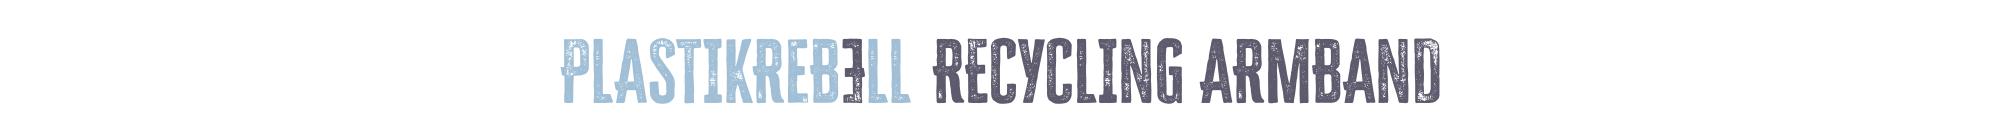 Recycling Armband Plastikrebell aus dem Meer